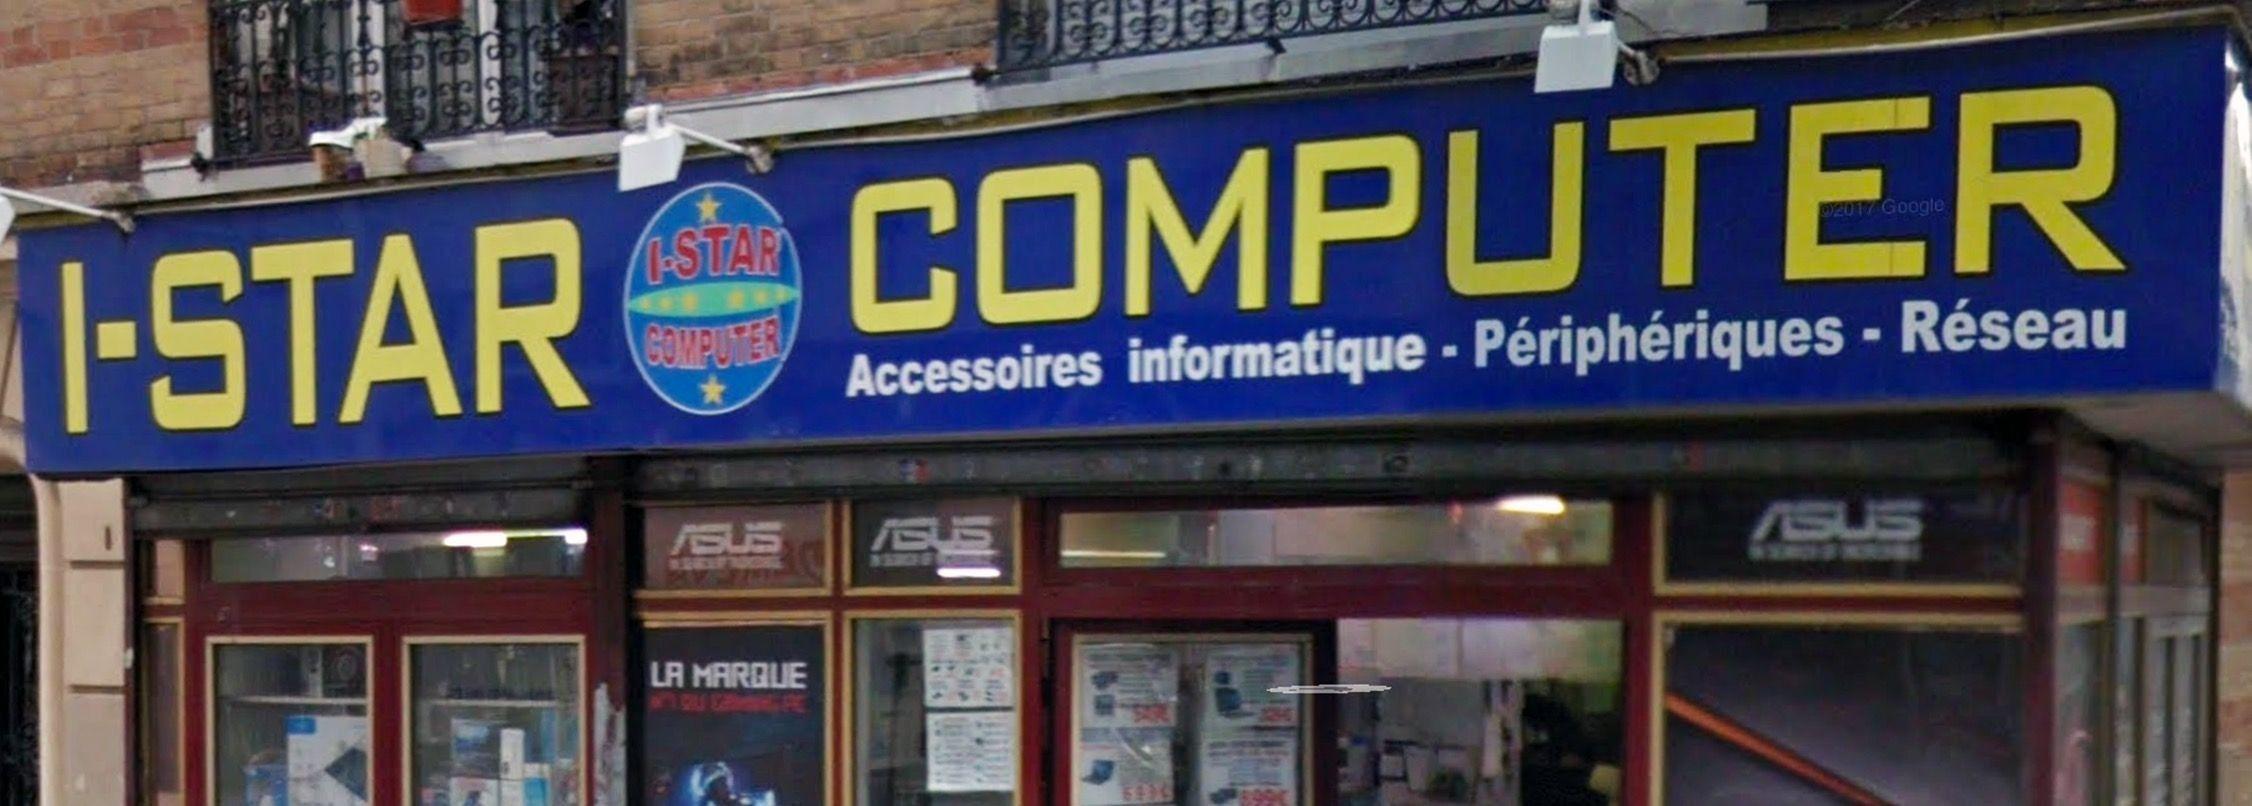 I-Star Computer